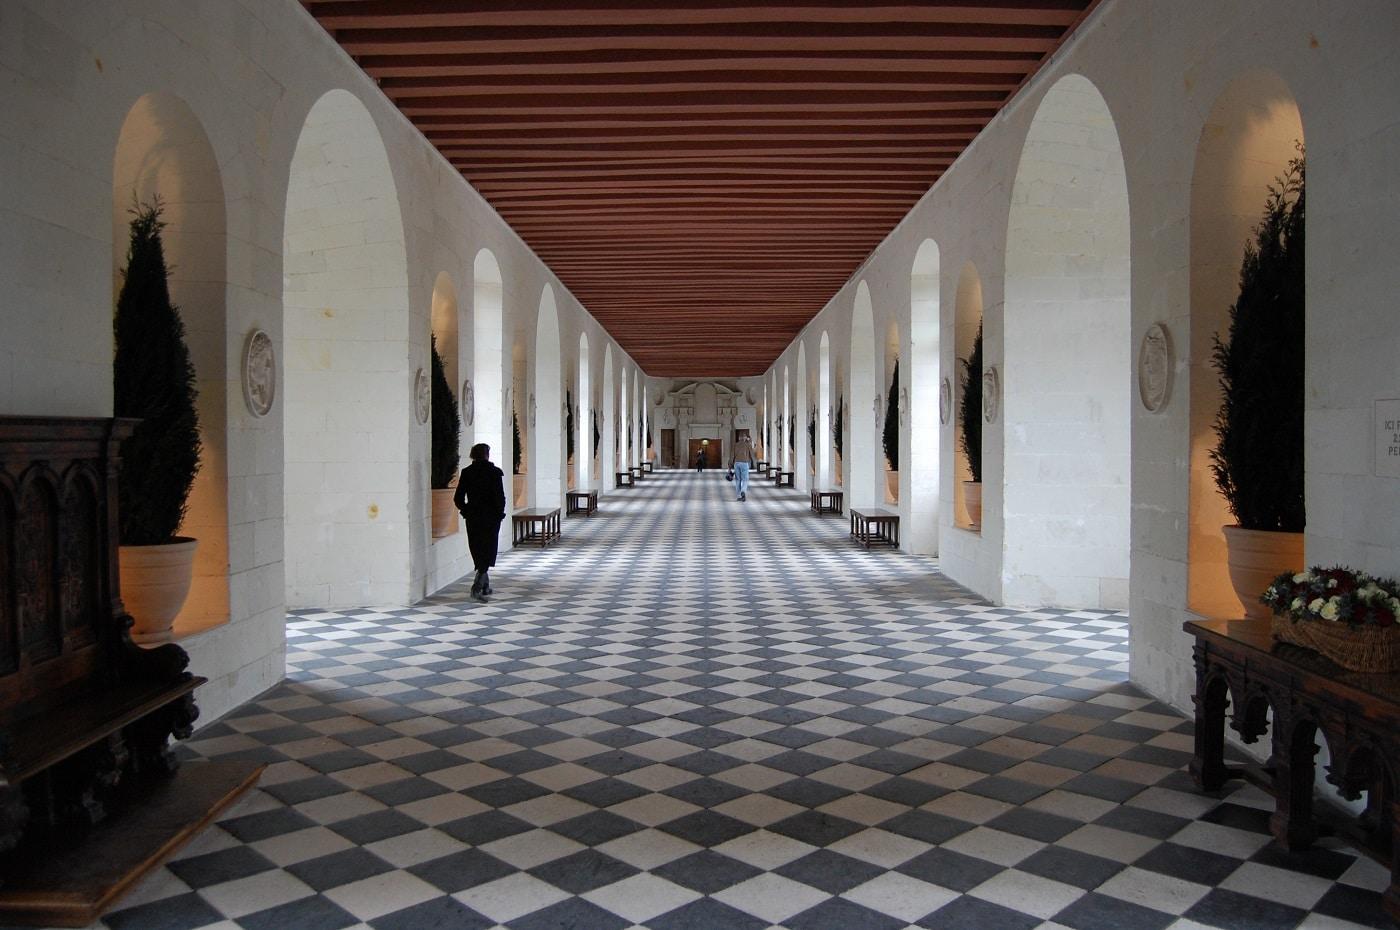 Castelul Chenonceau, hol interior